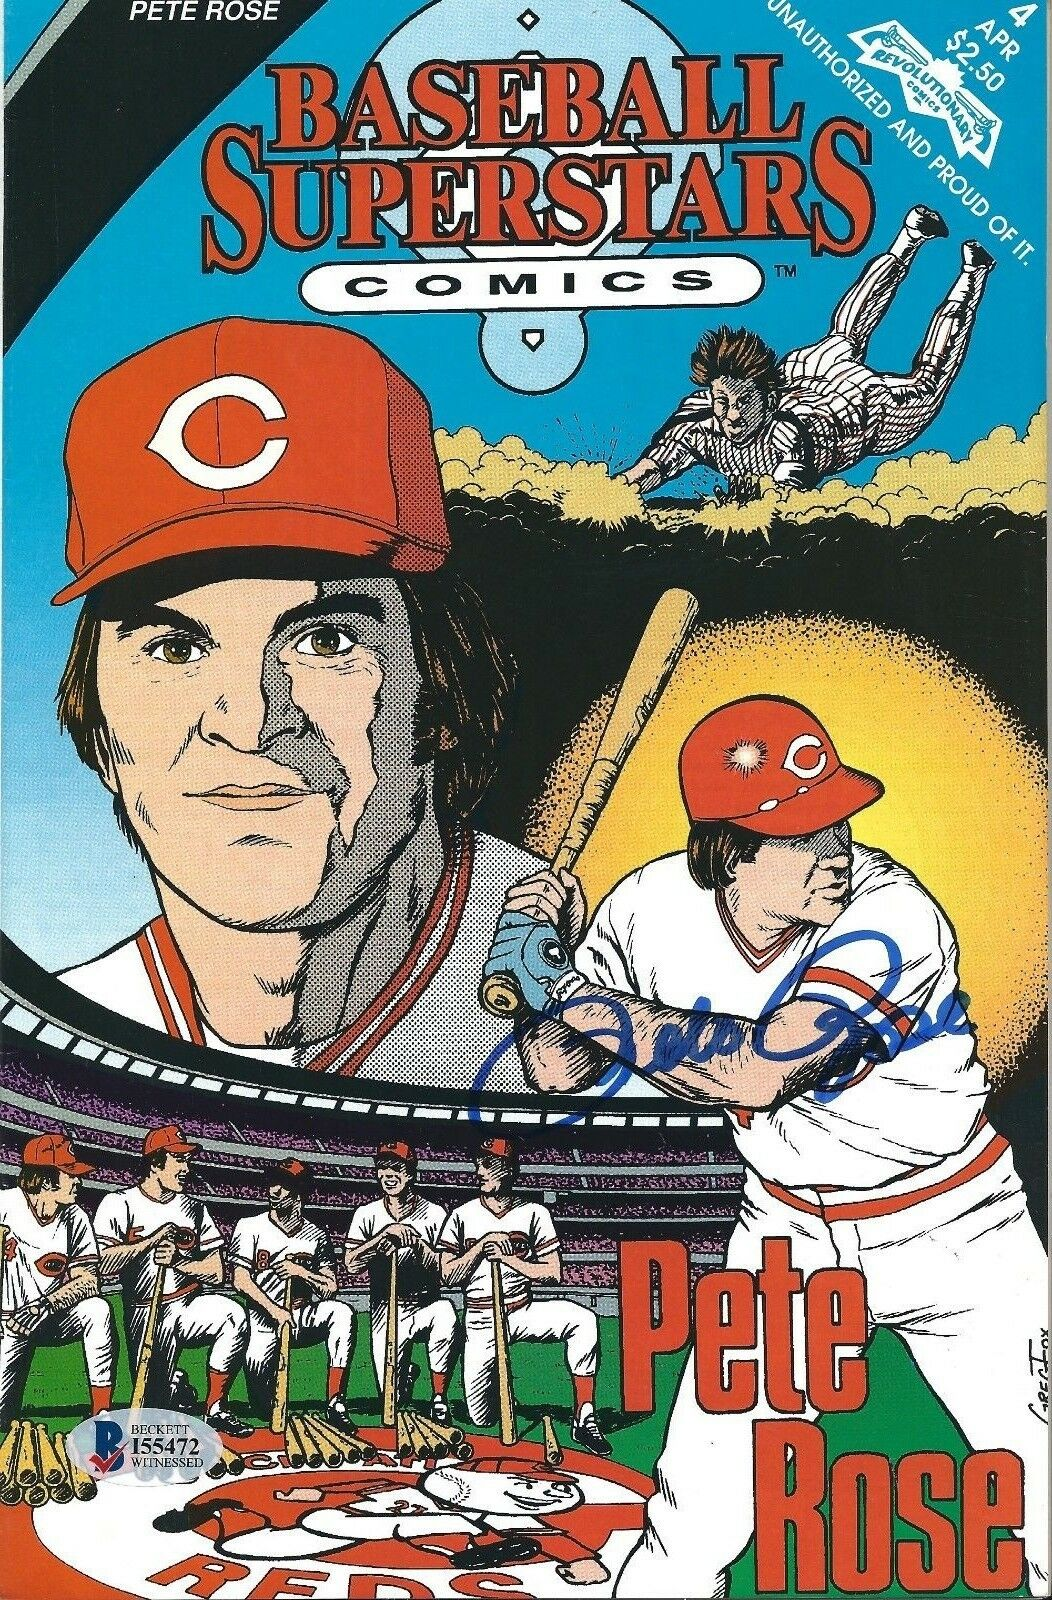 Pete Rose Signed Baseball Superstars Comic Book *Cincinnati Reds Beckett I55472